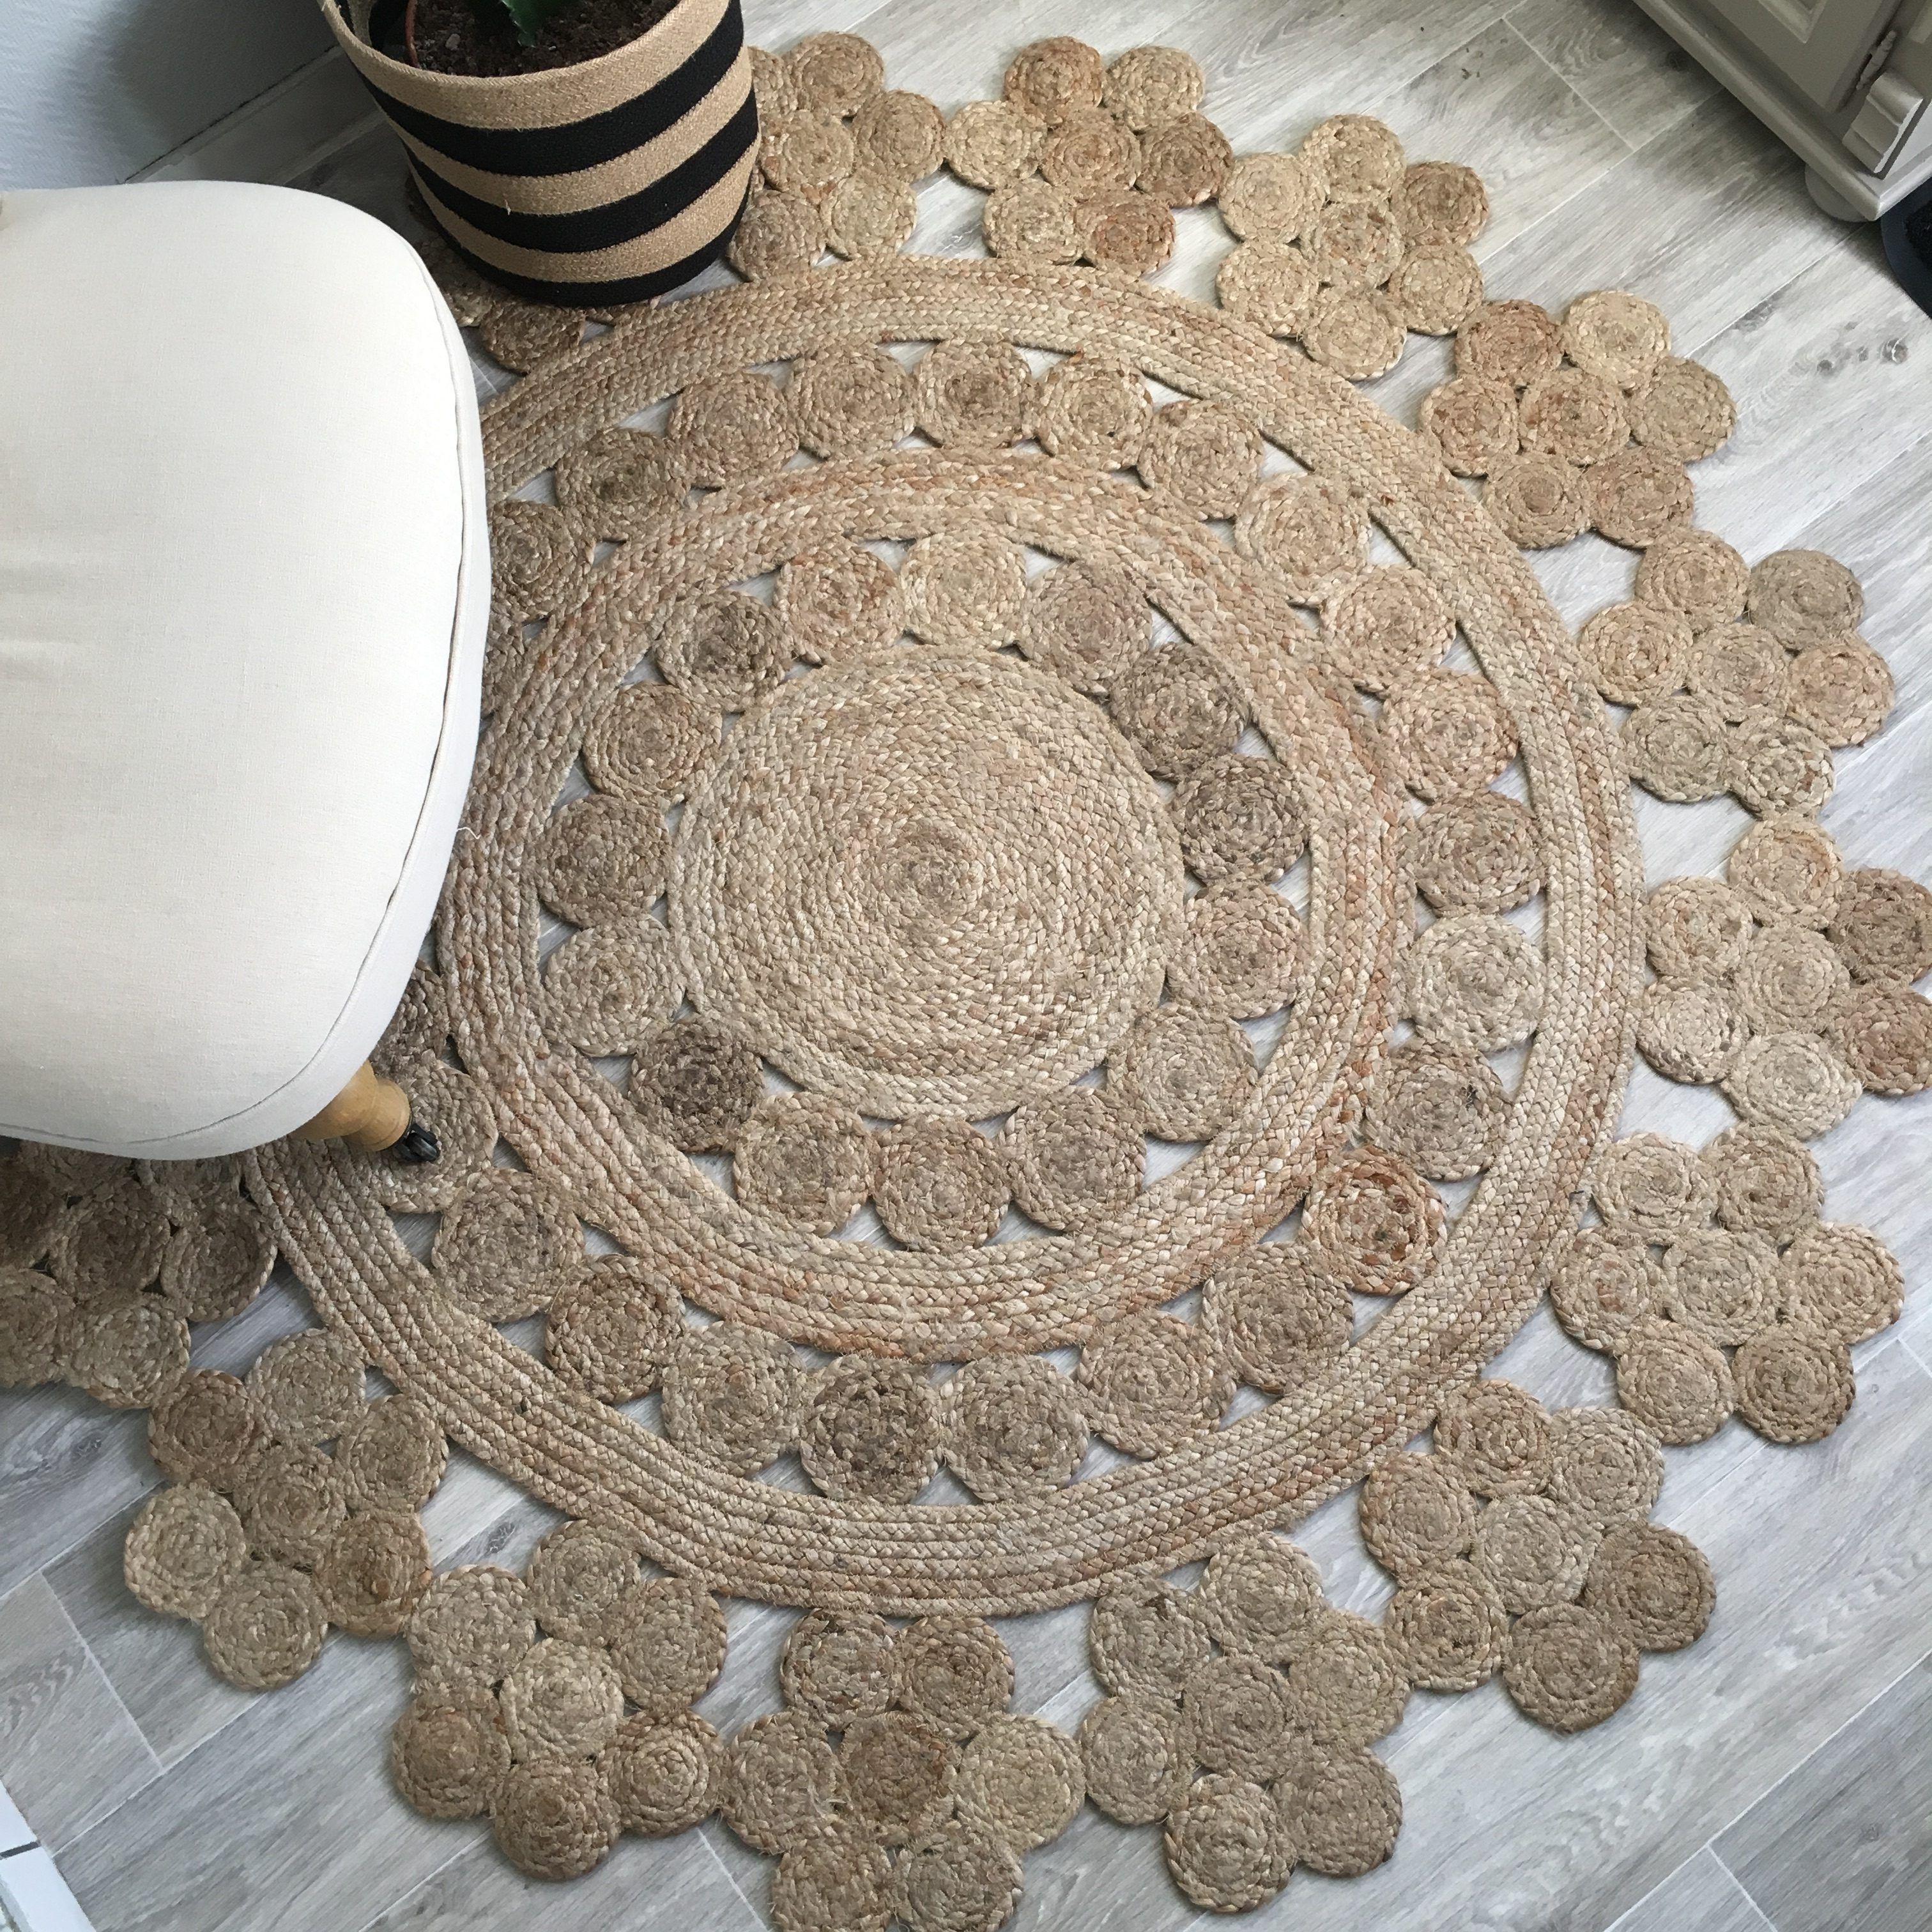 Les Tapis Ronds En Jute Objet Decoration En 2019 Diy Furniture